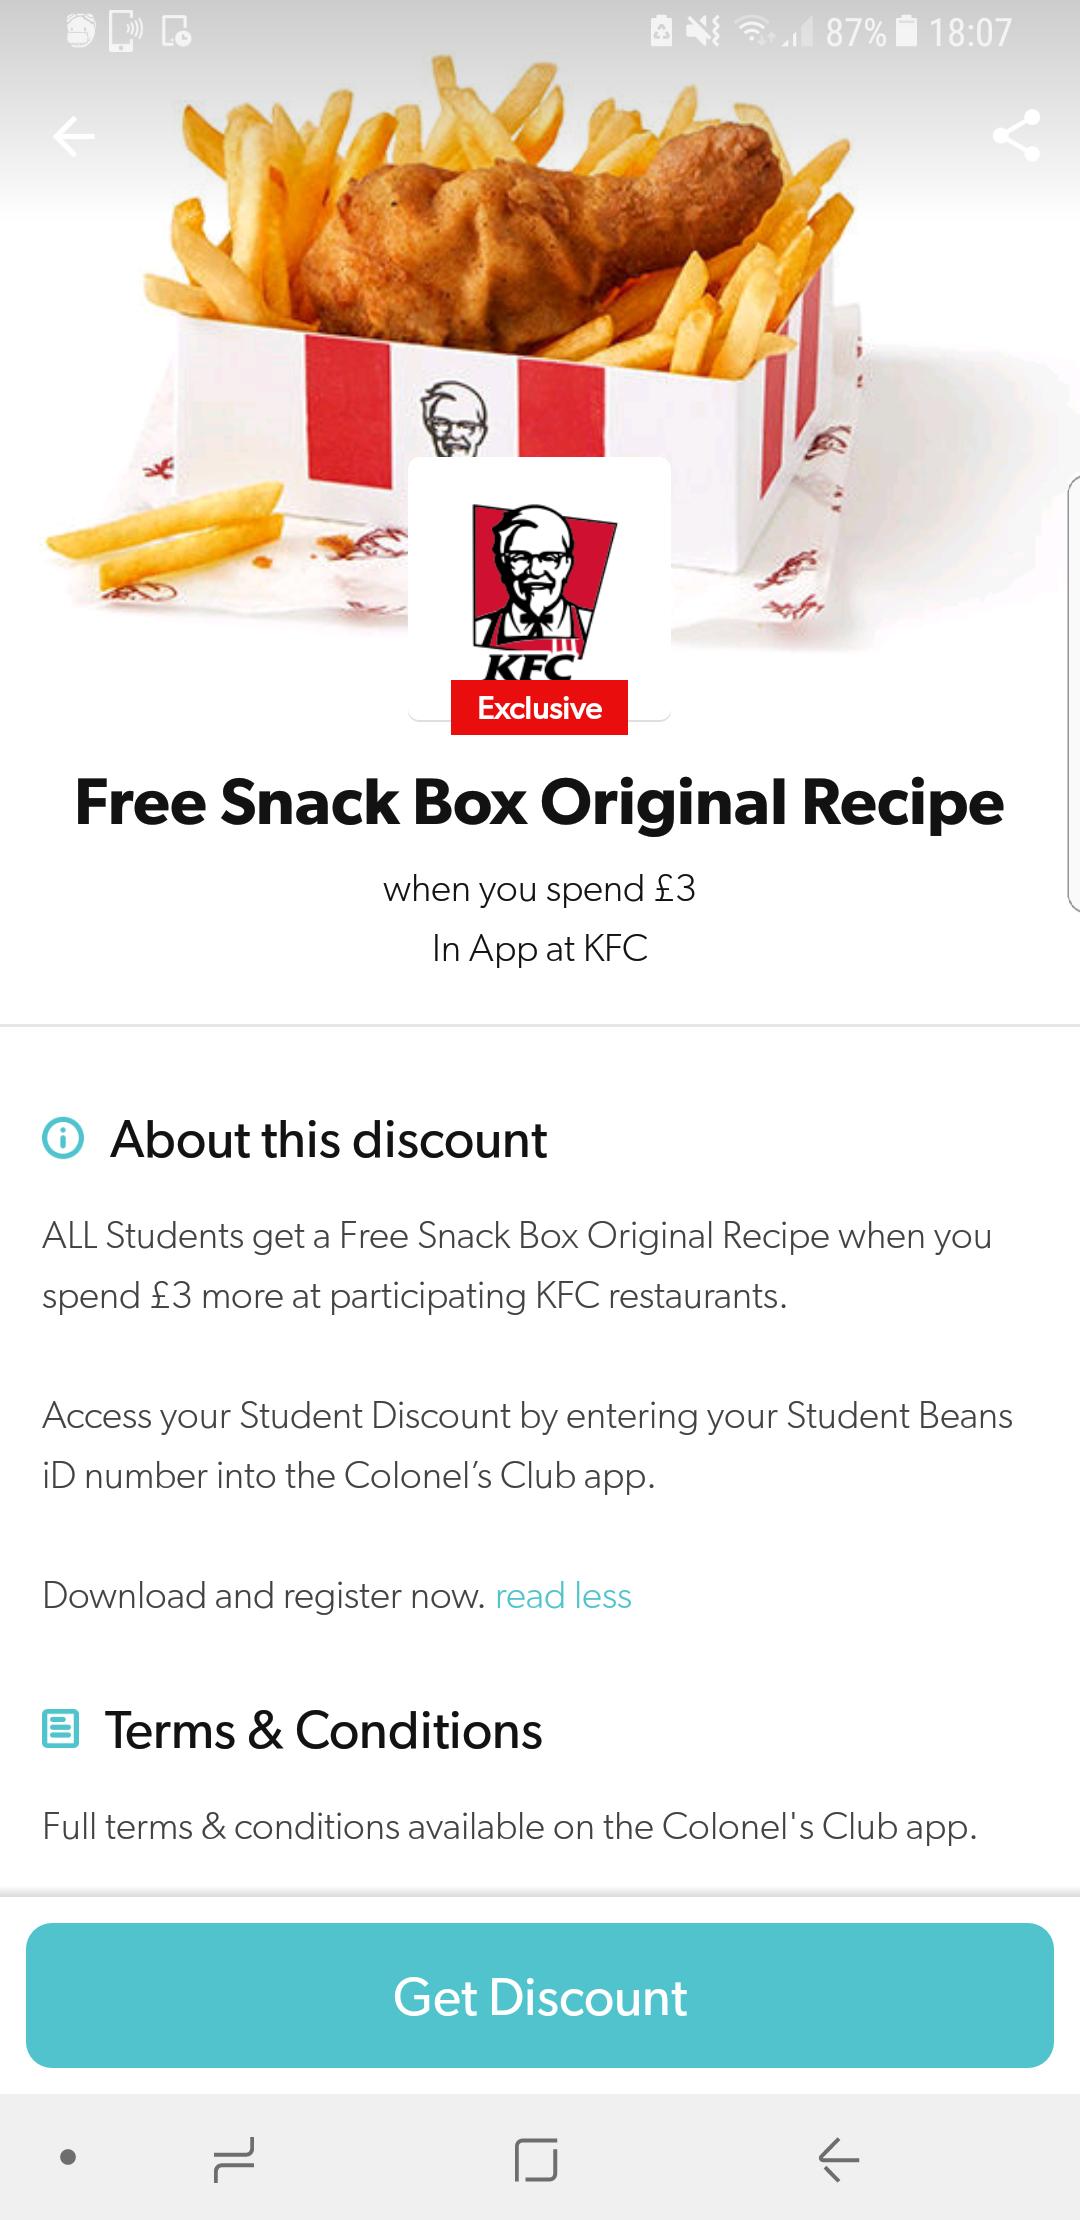 KFC - free original recipe snackbox when you spend £3 via student beans